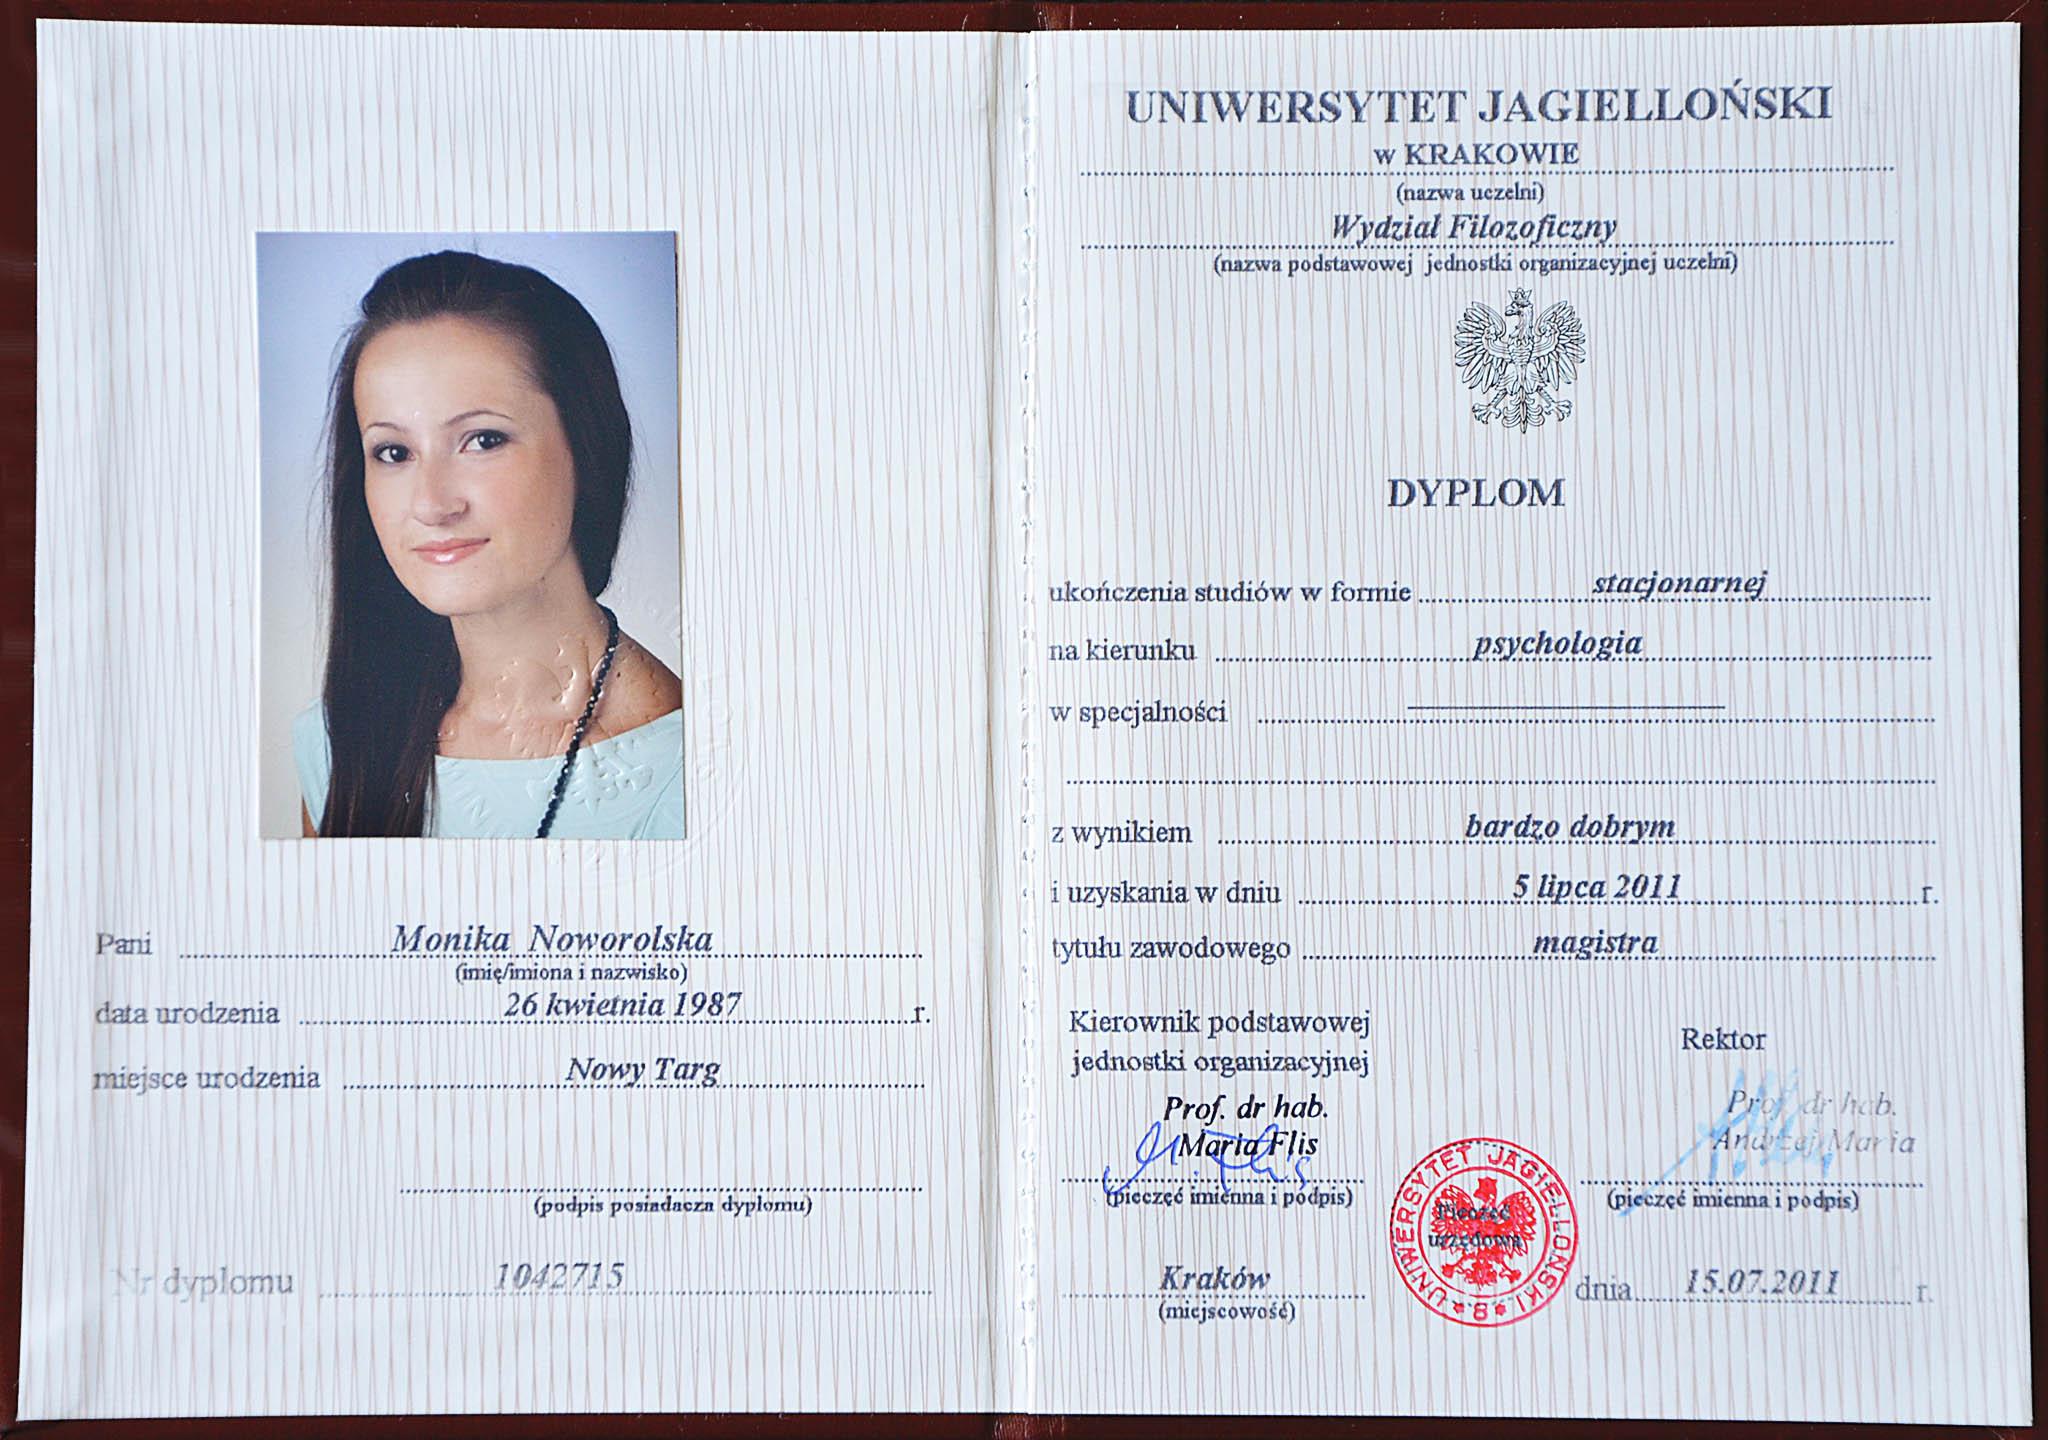 dyplom psychologia uniwersytet jagielloński